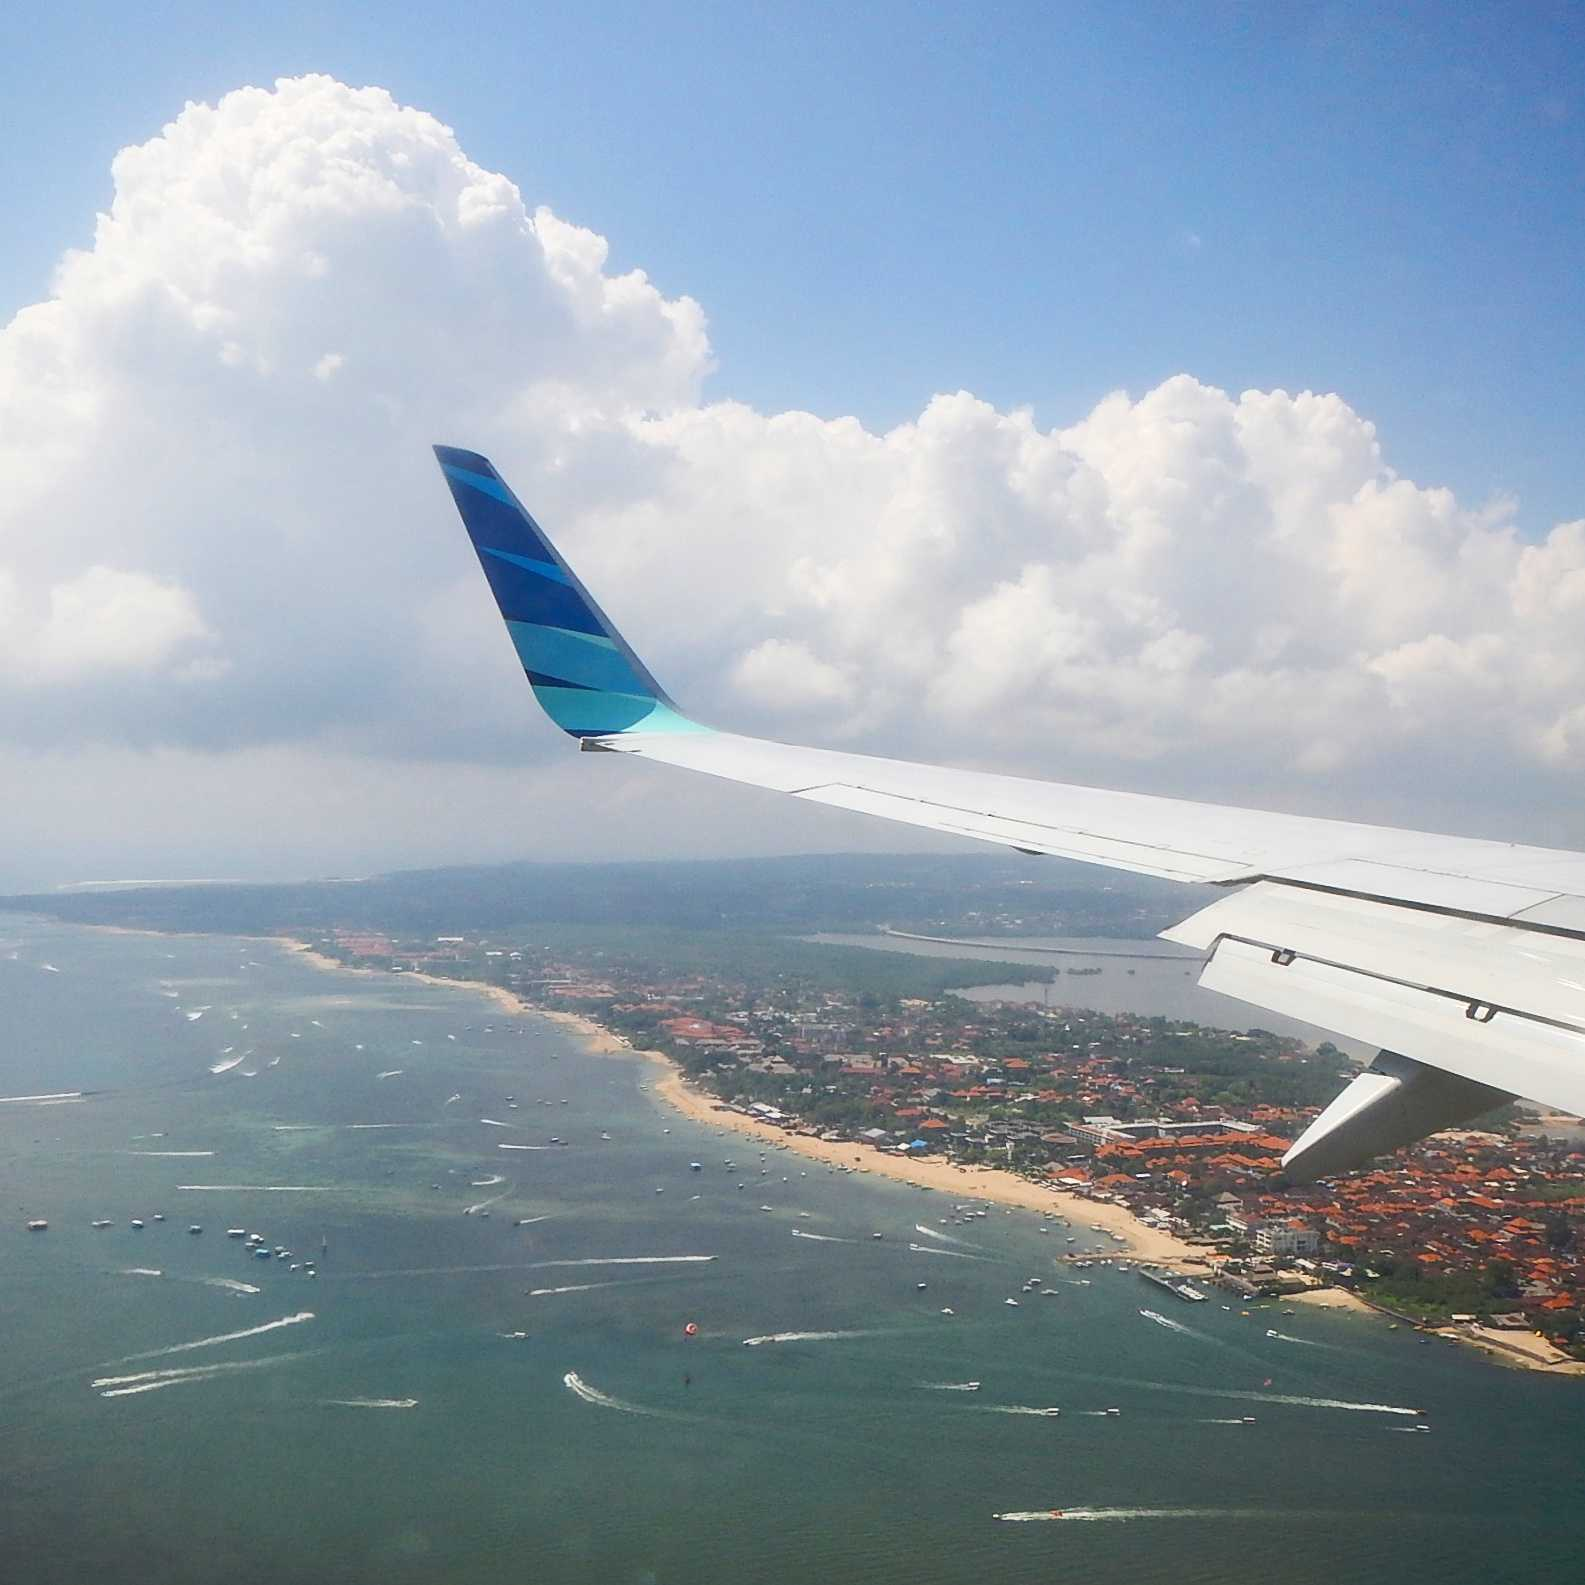 denpasar airport departures